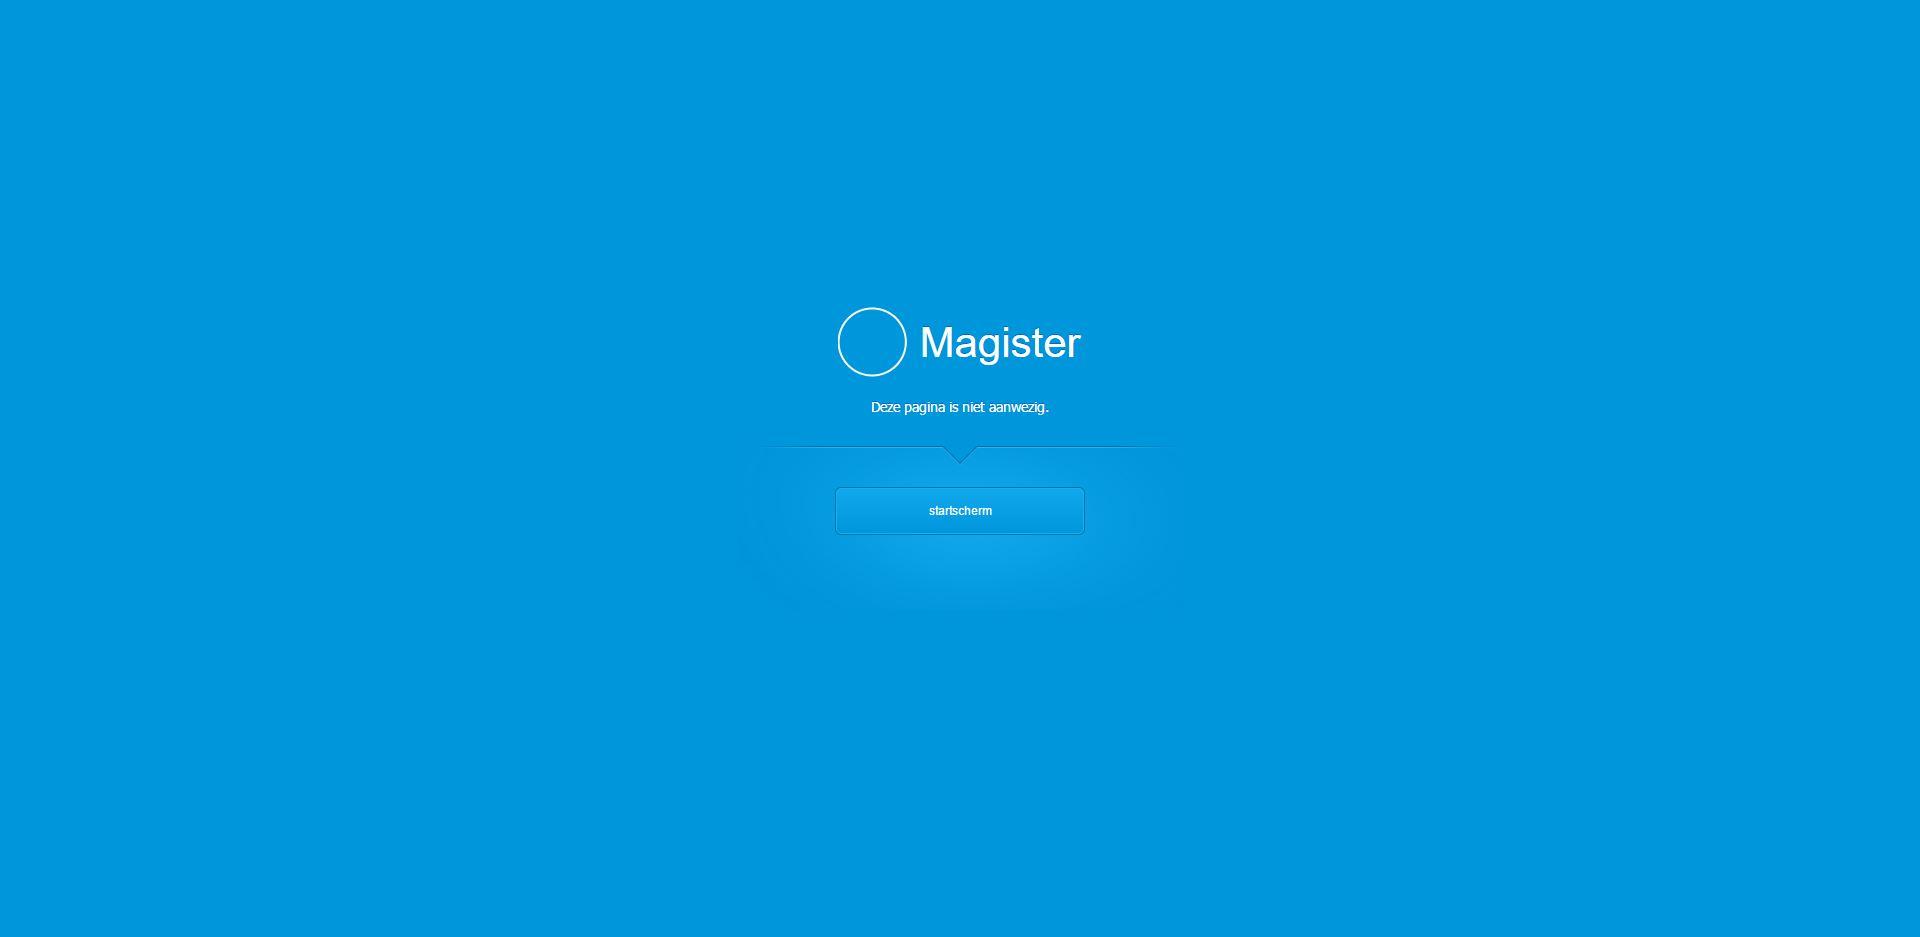 Leerlingen krijgen bericht over storing Magister via Magister